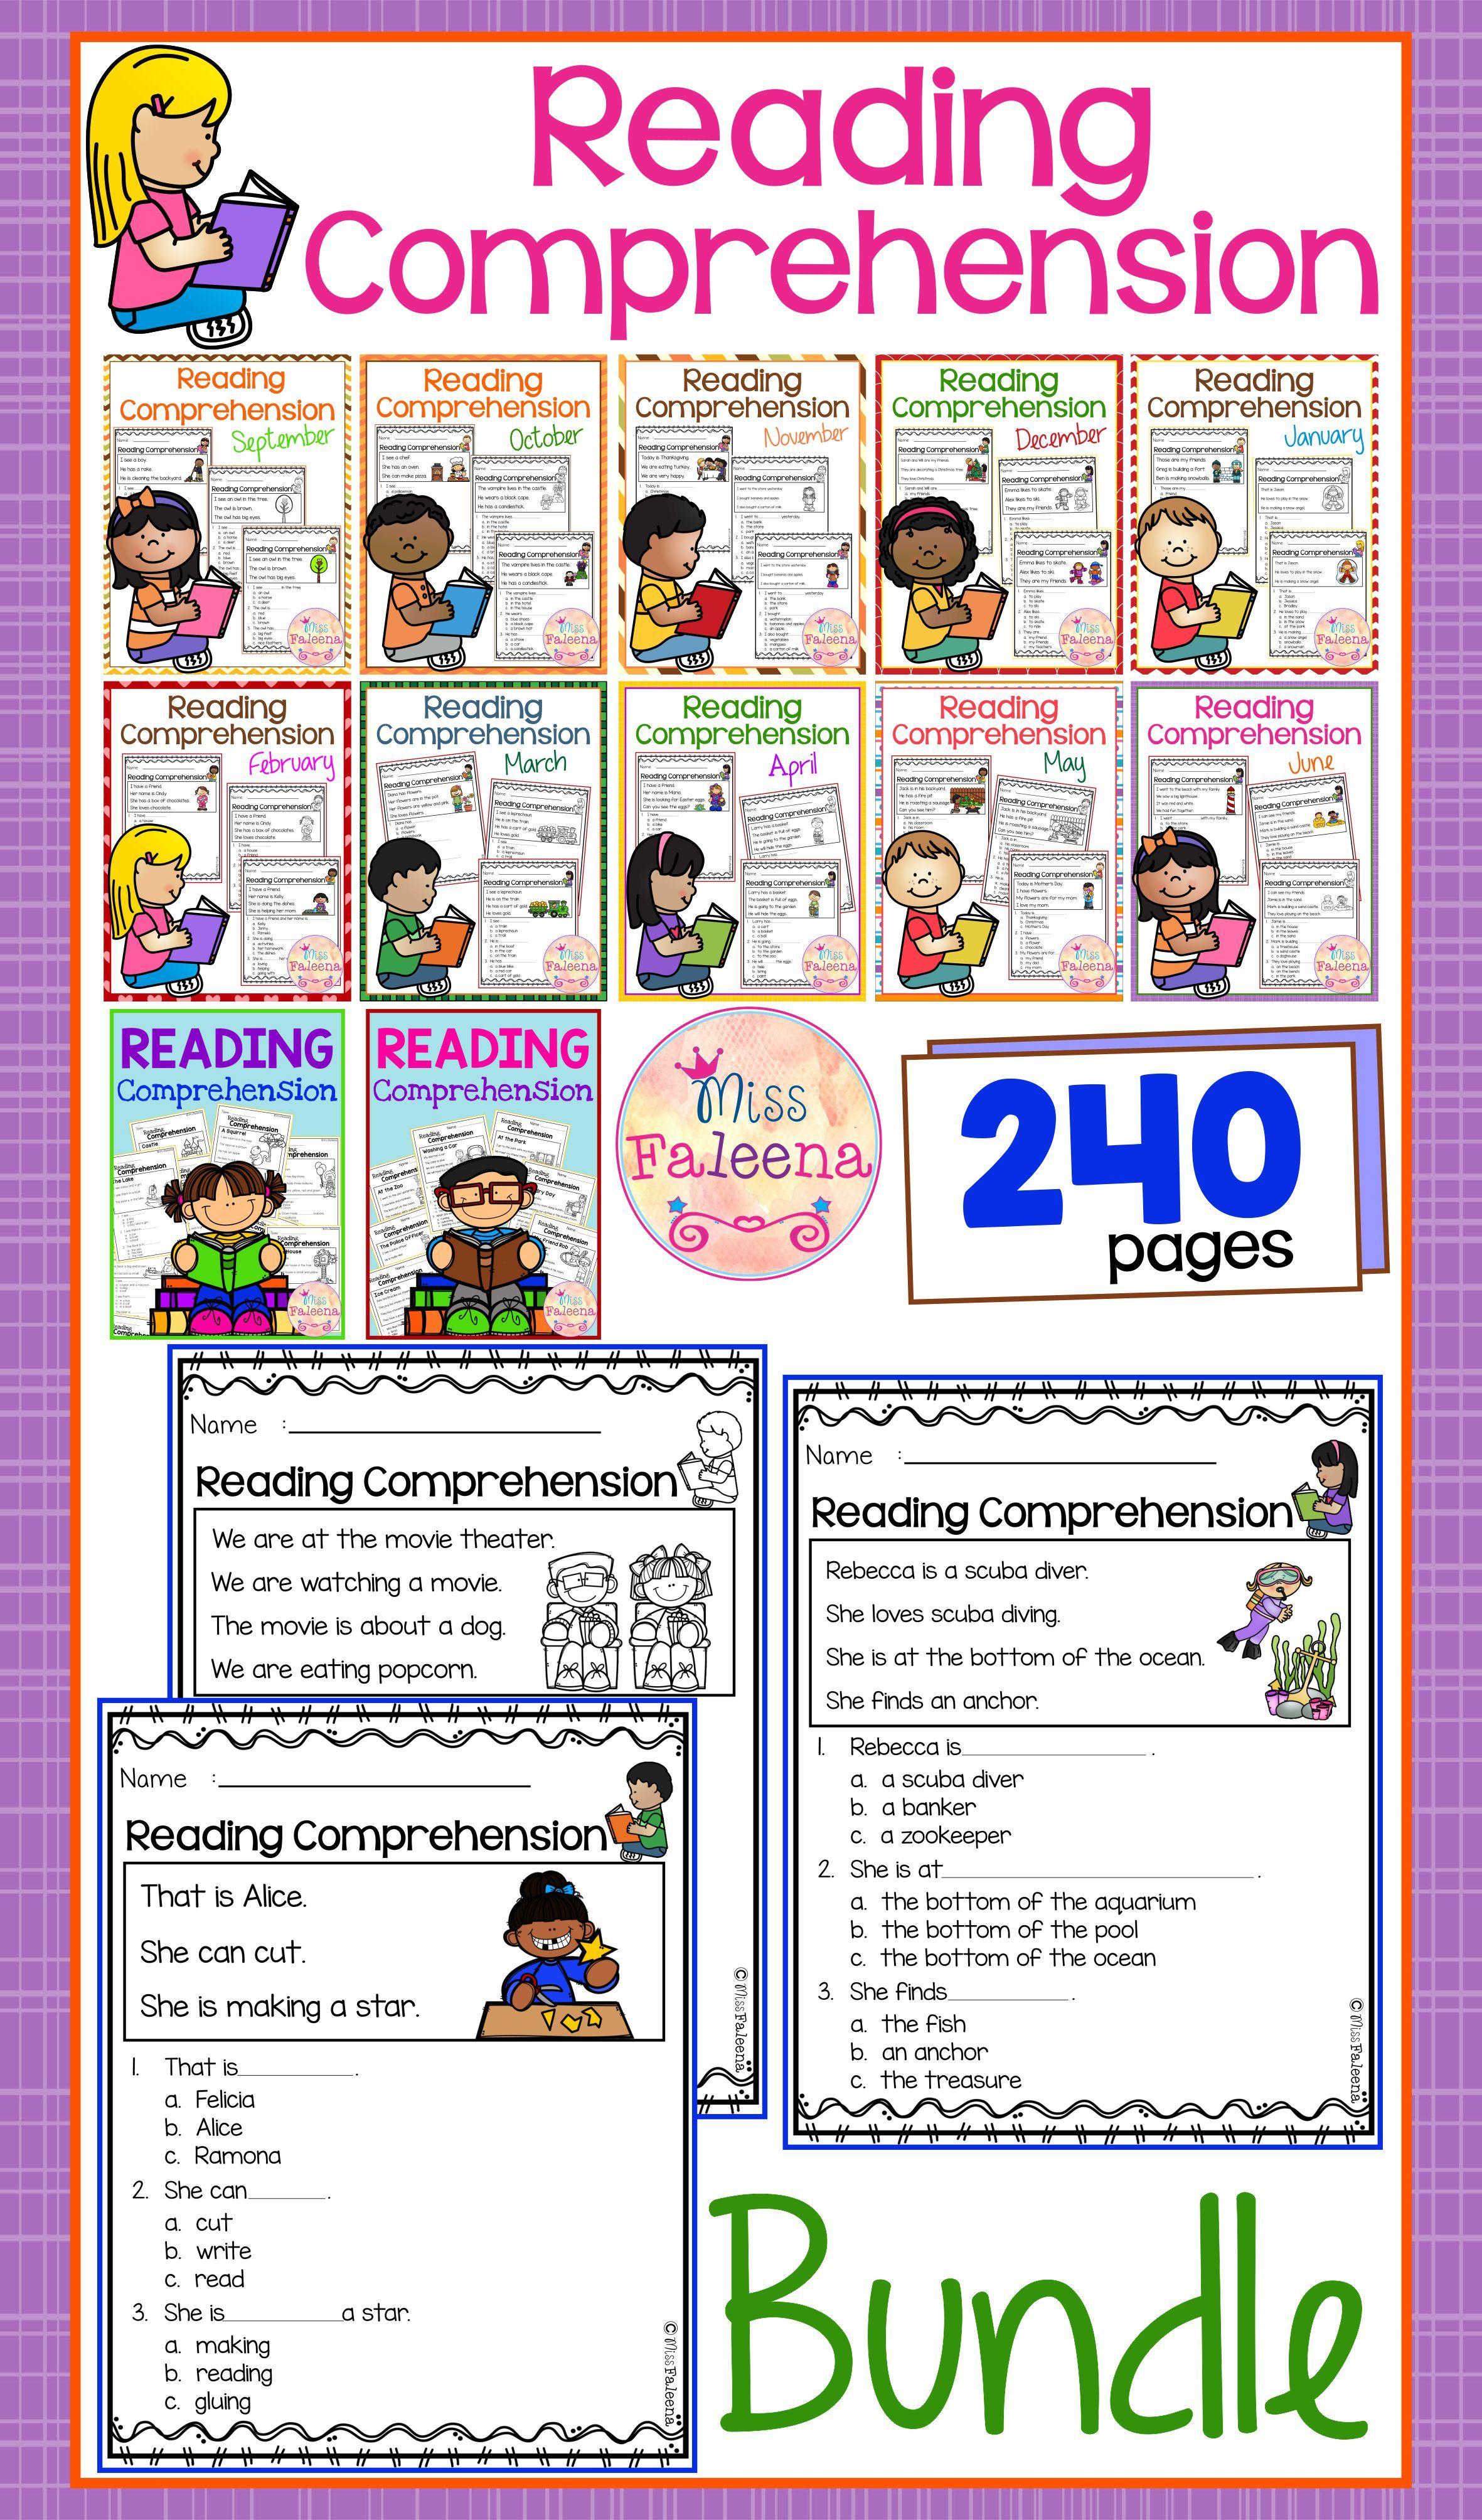 Reading Comprehension The Bundle